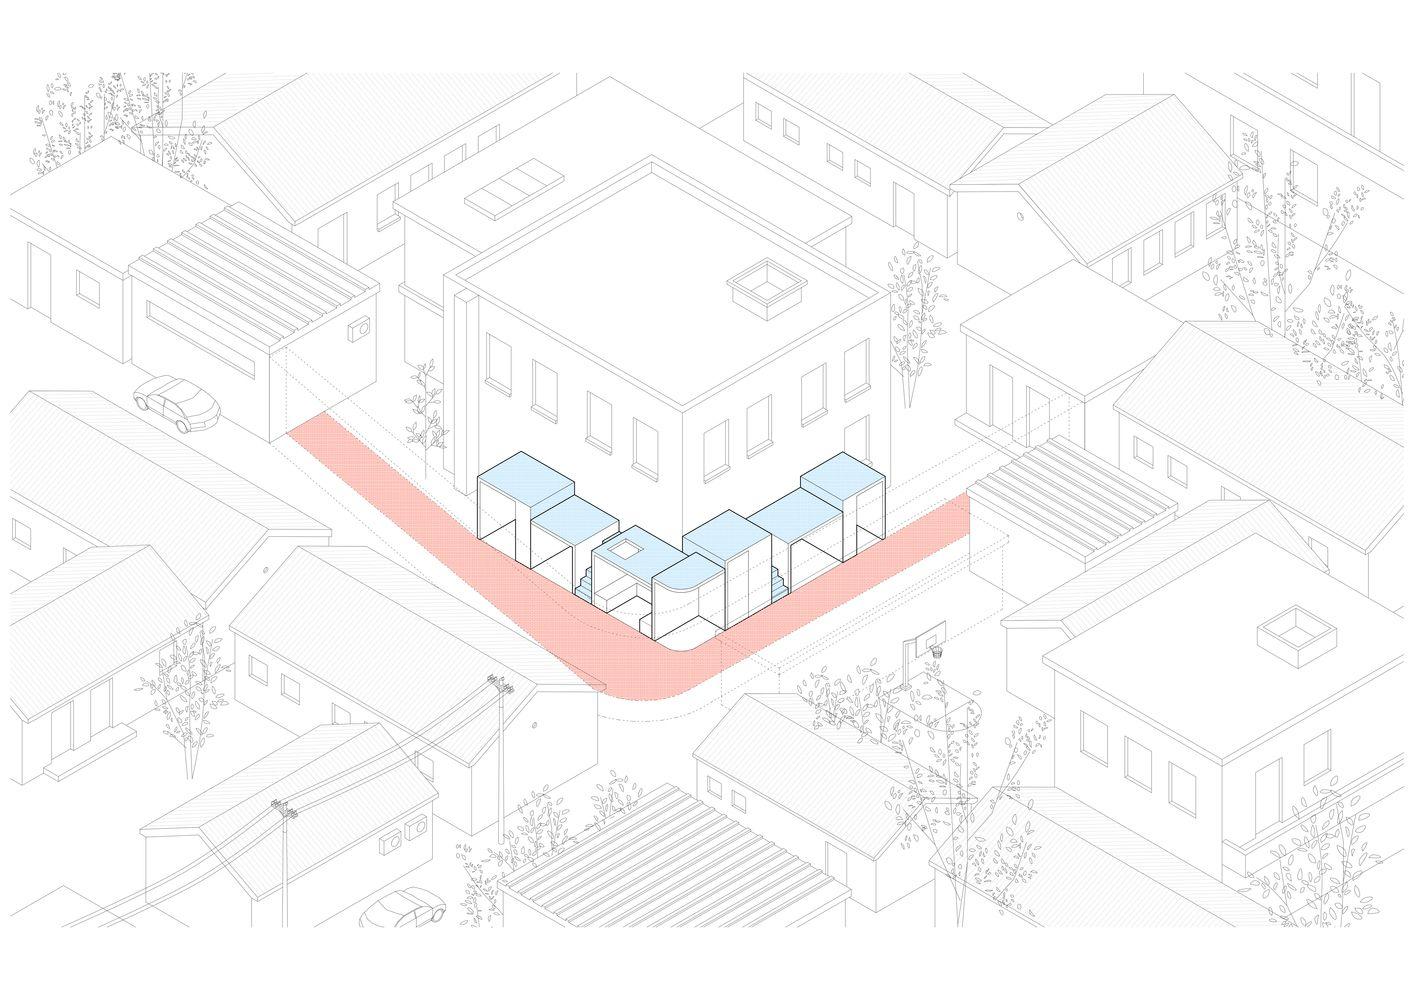 Galeria De Casa Dengshikou Hutong B L U E Architecture Studio